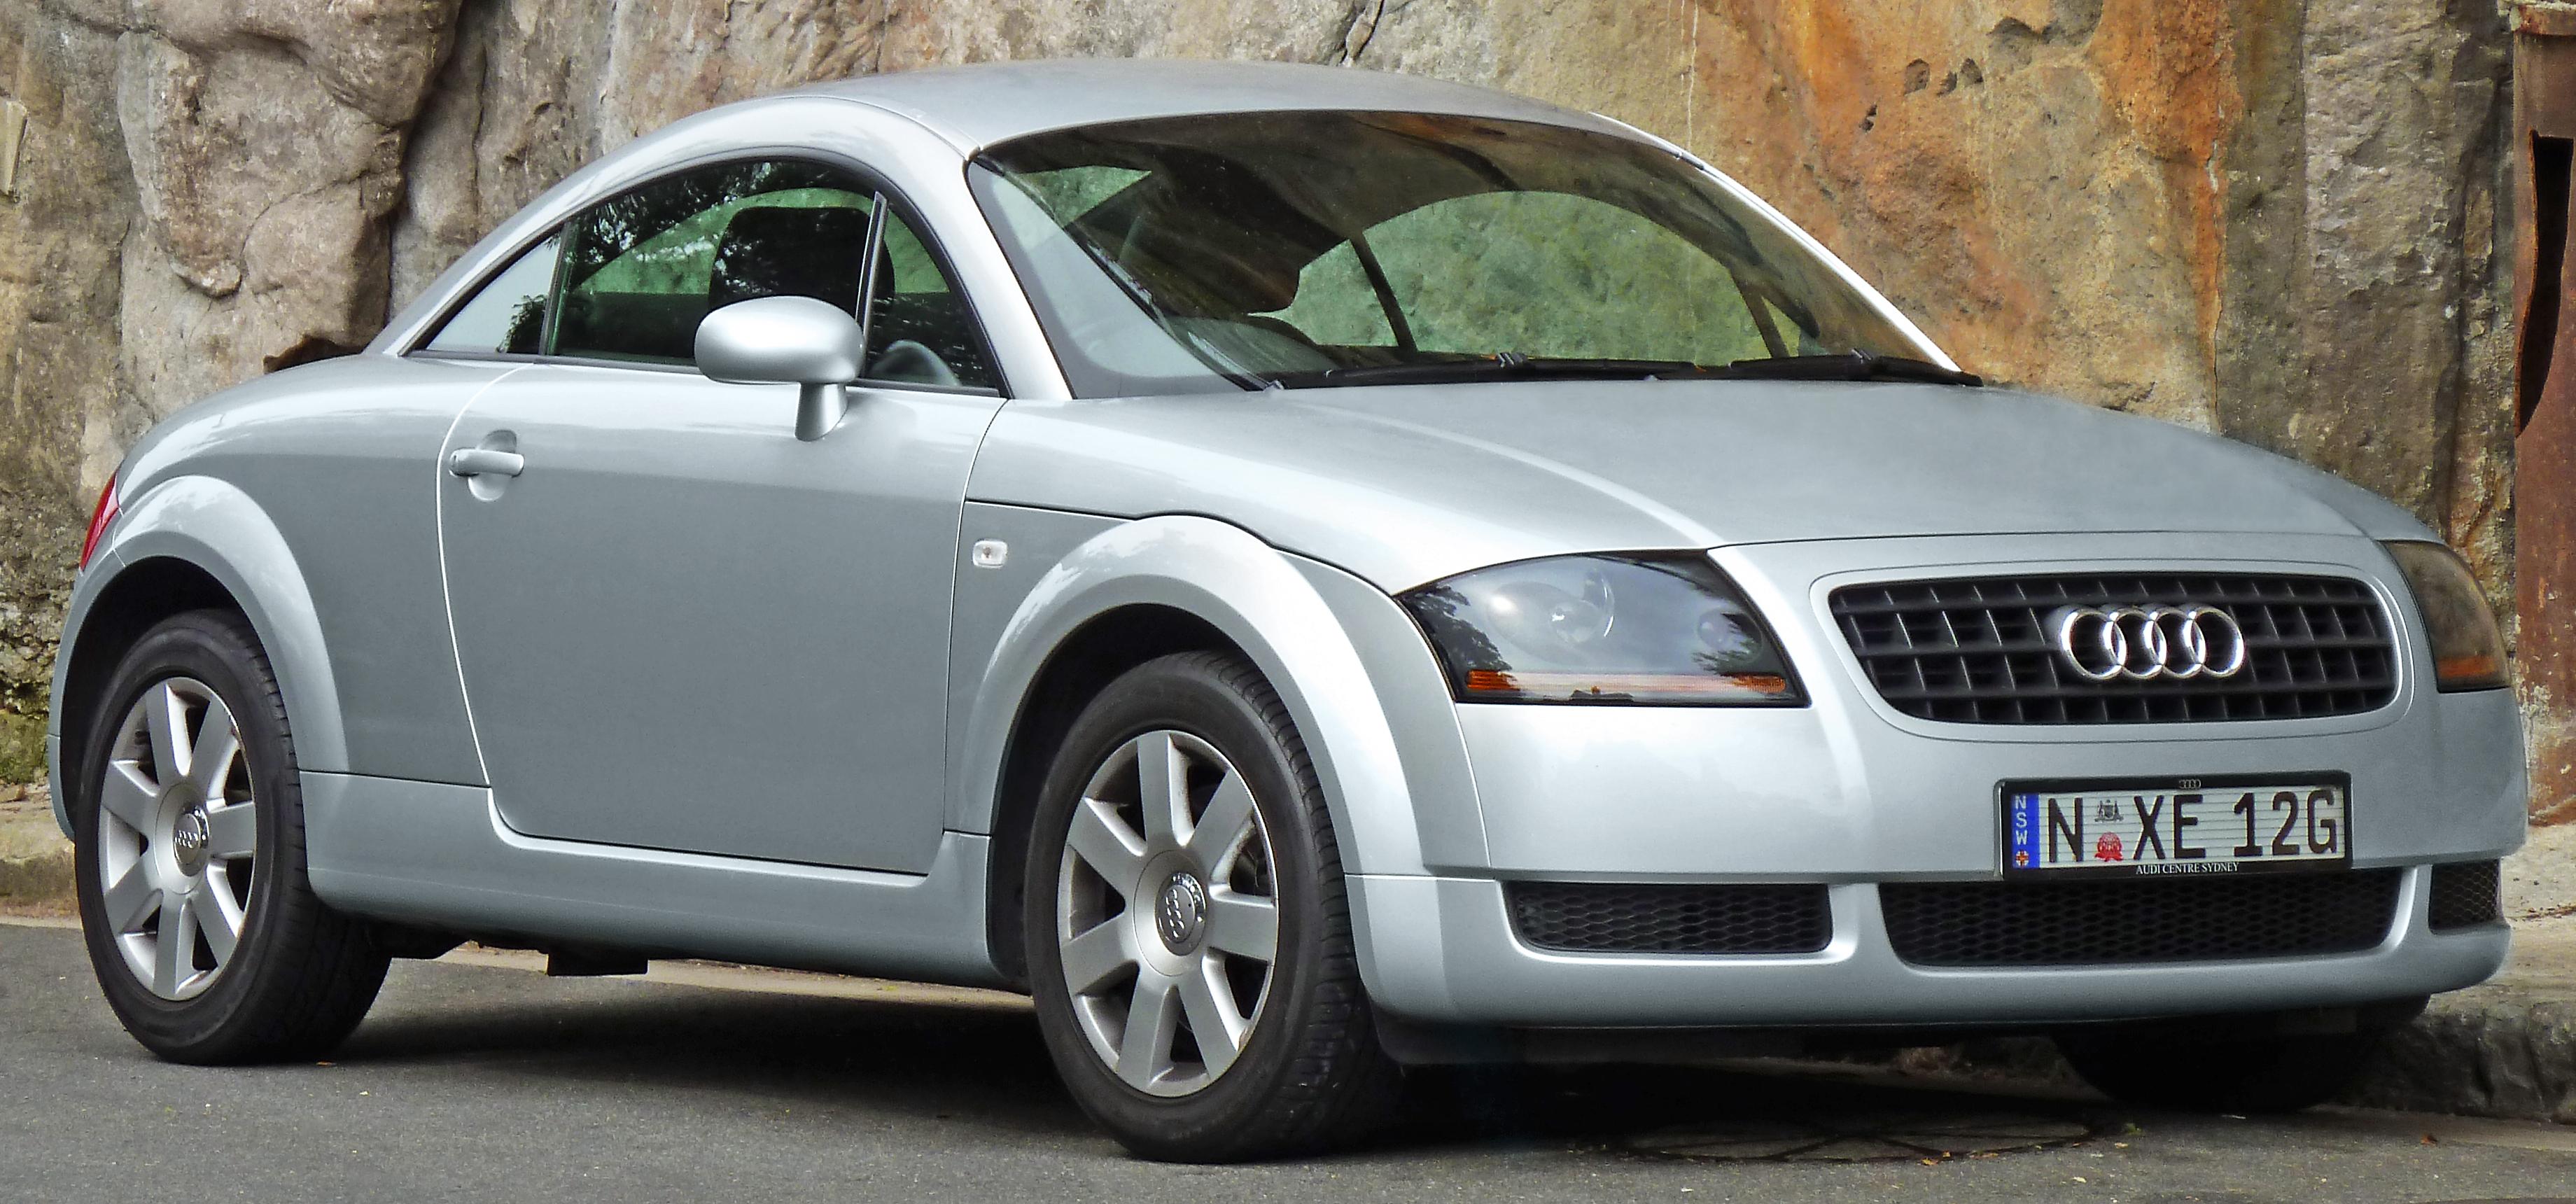 Audi tt 1.8 t coupe